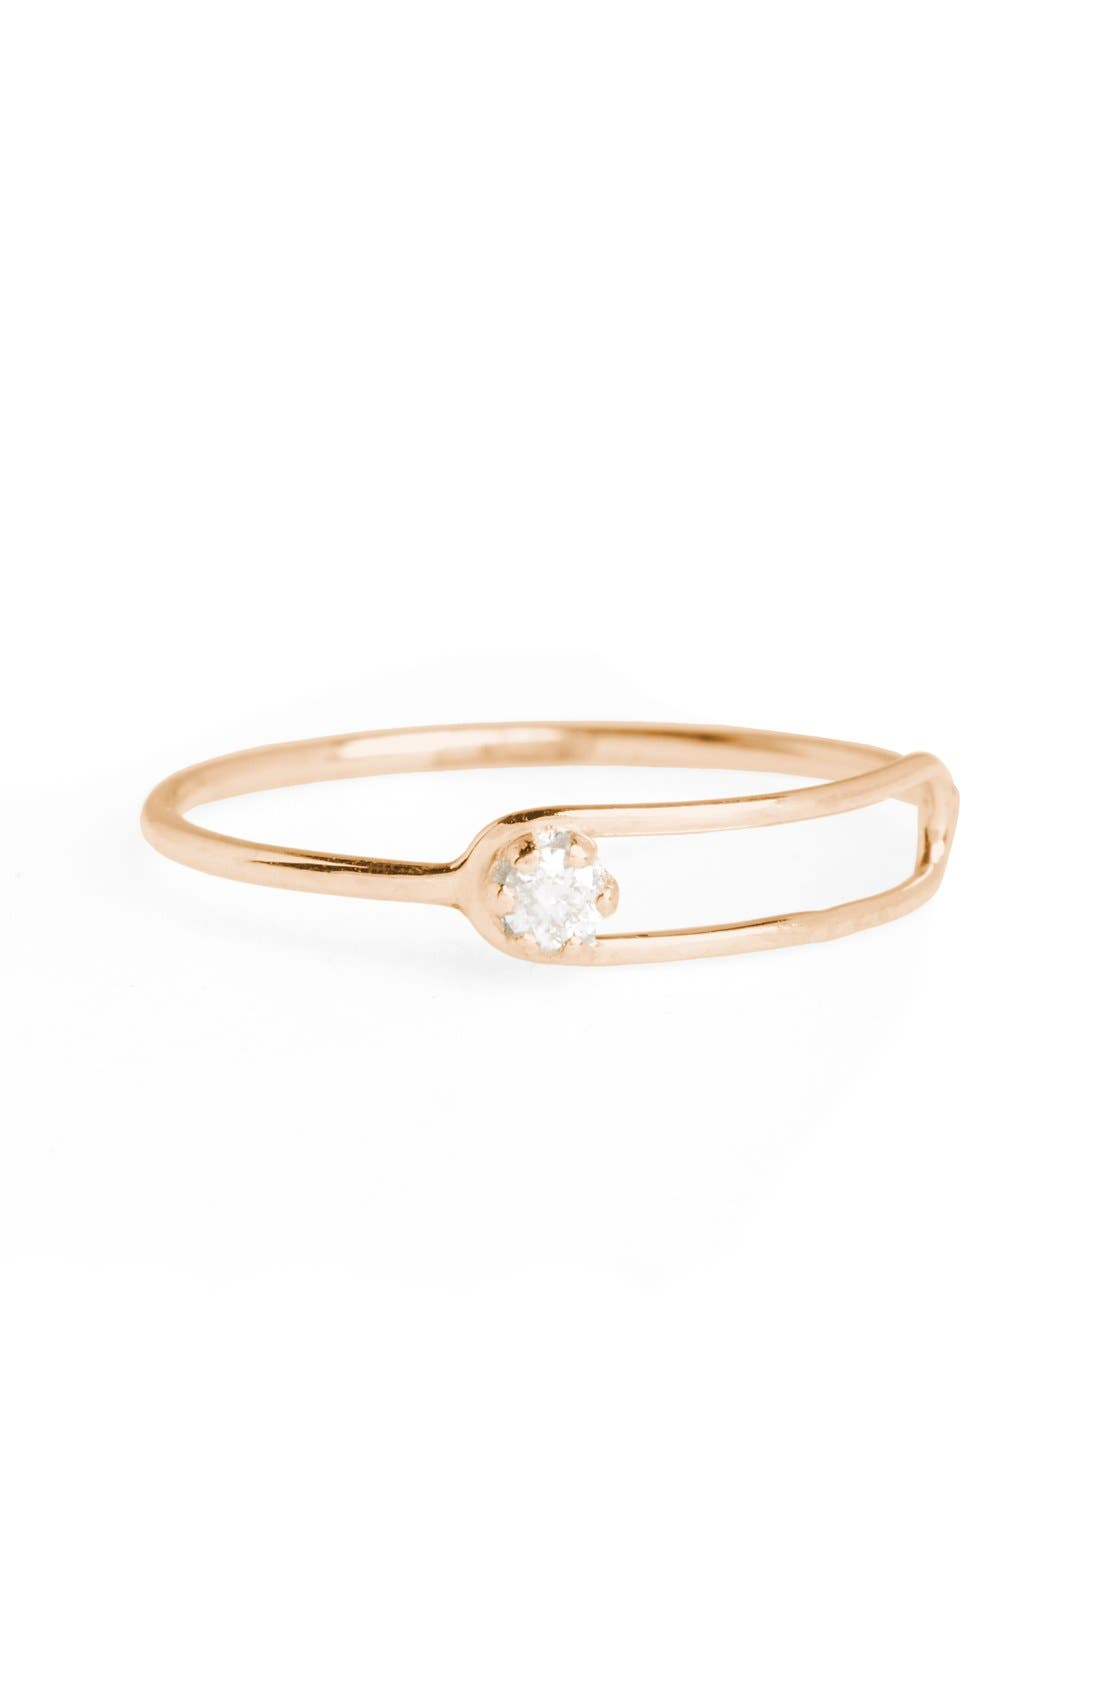 SARAH & SEBASTIAN Nimbus Diamond Oblong Ring